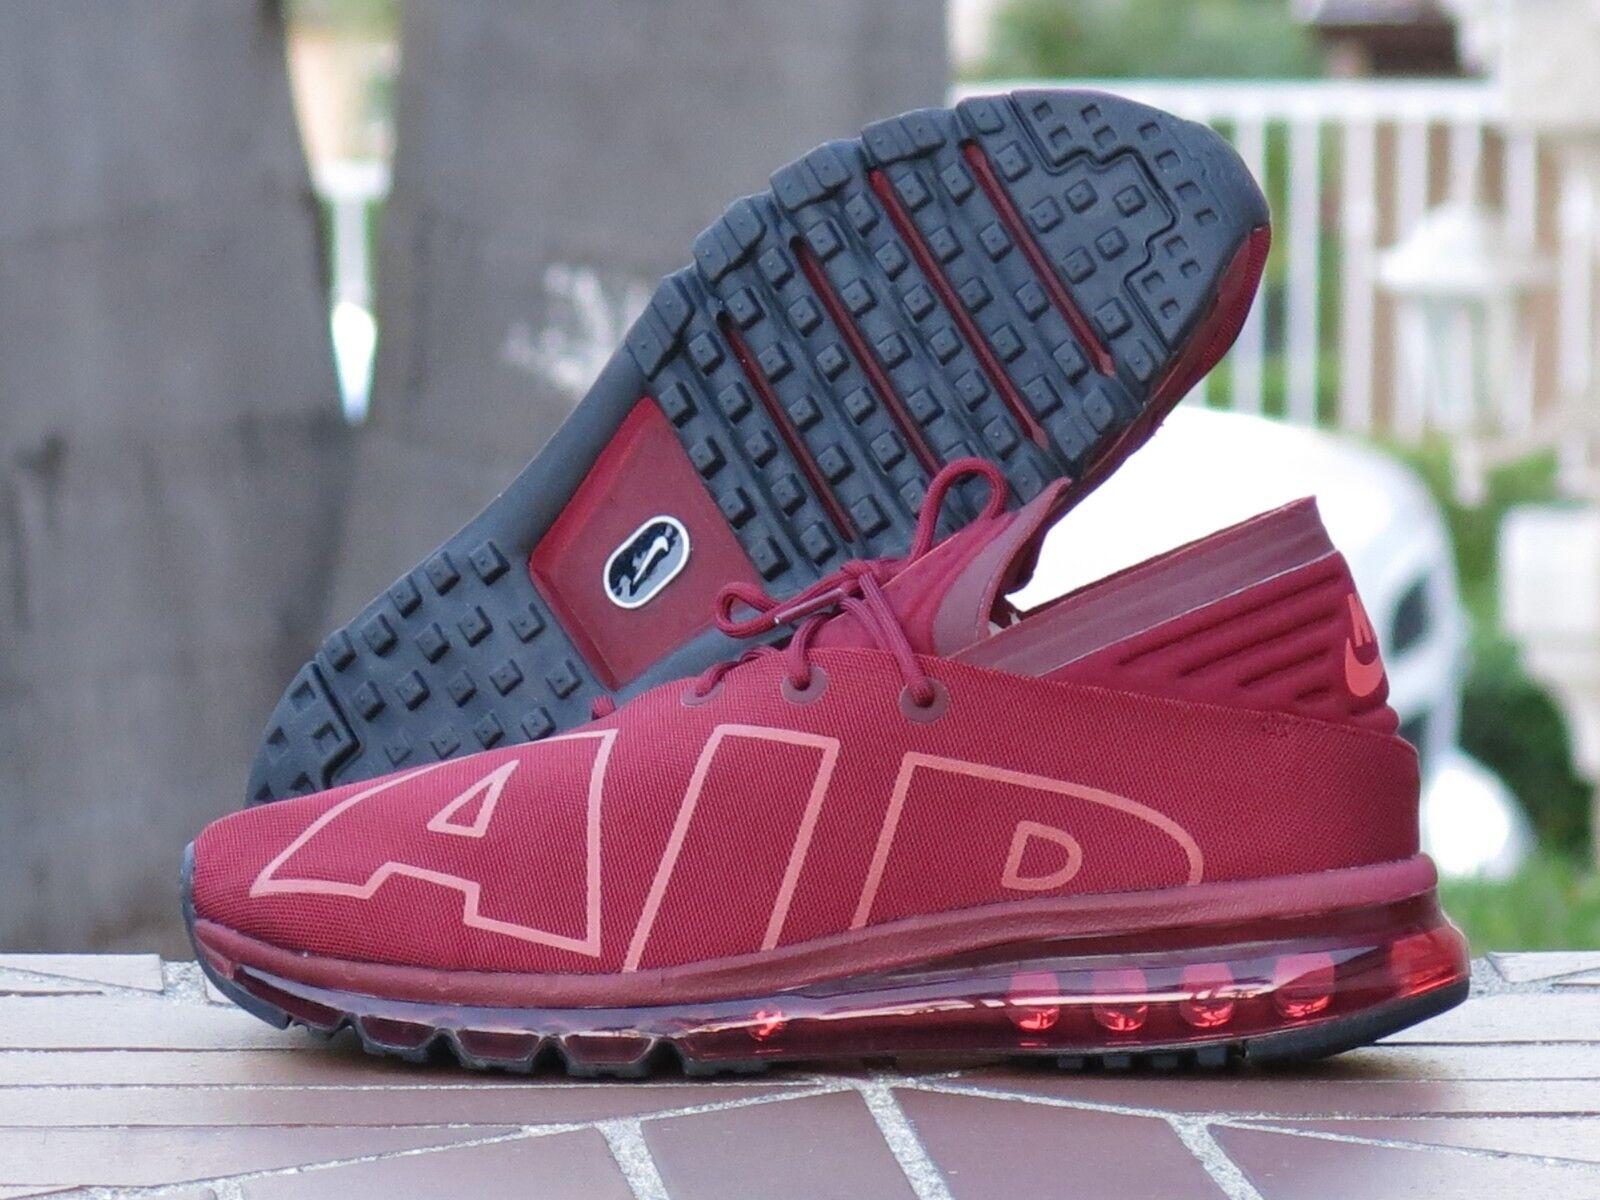 Nike Air Max SE Running, Cross Training Sneakers AA4084 600